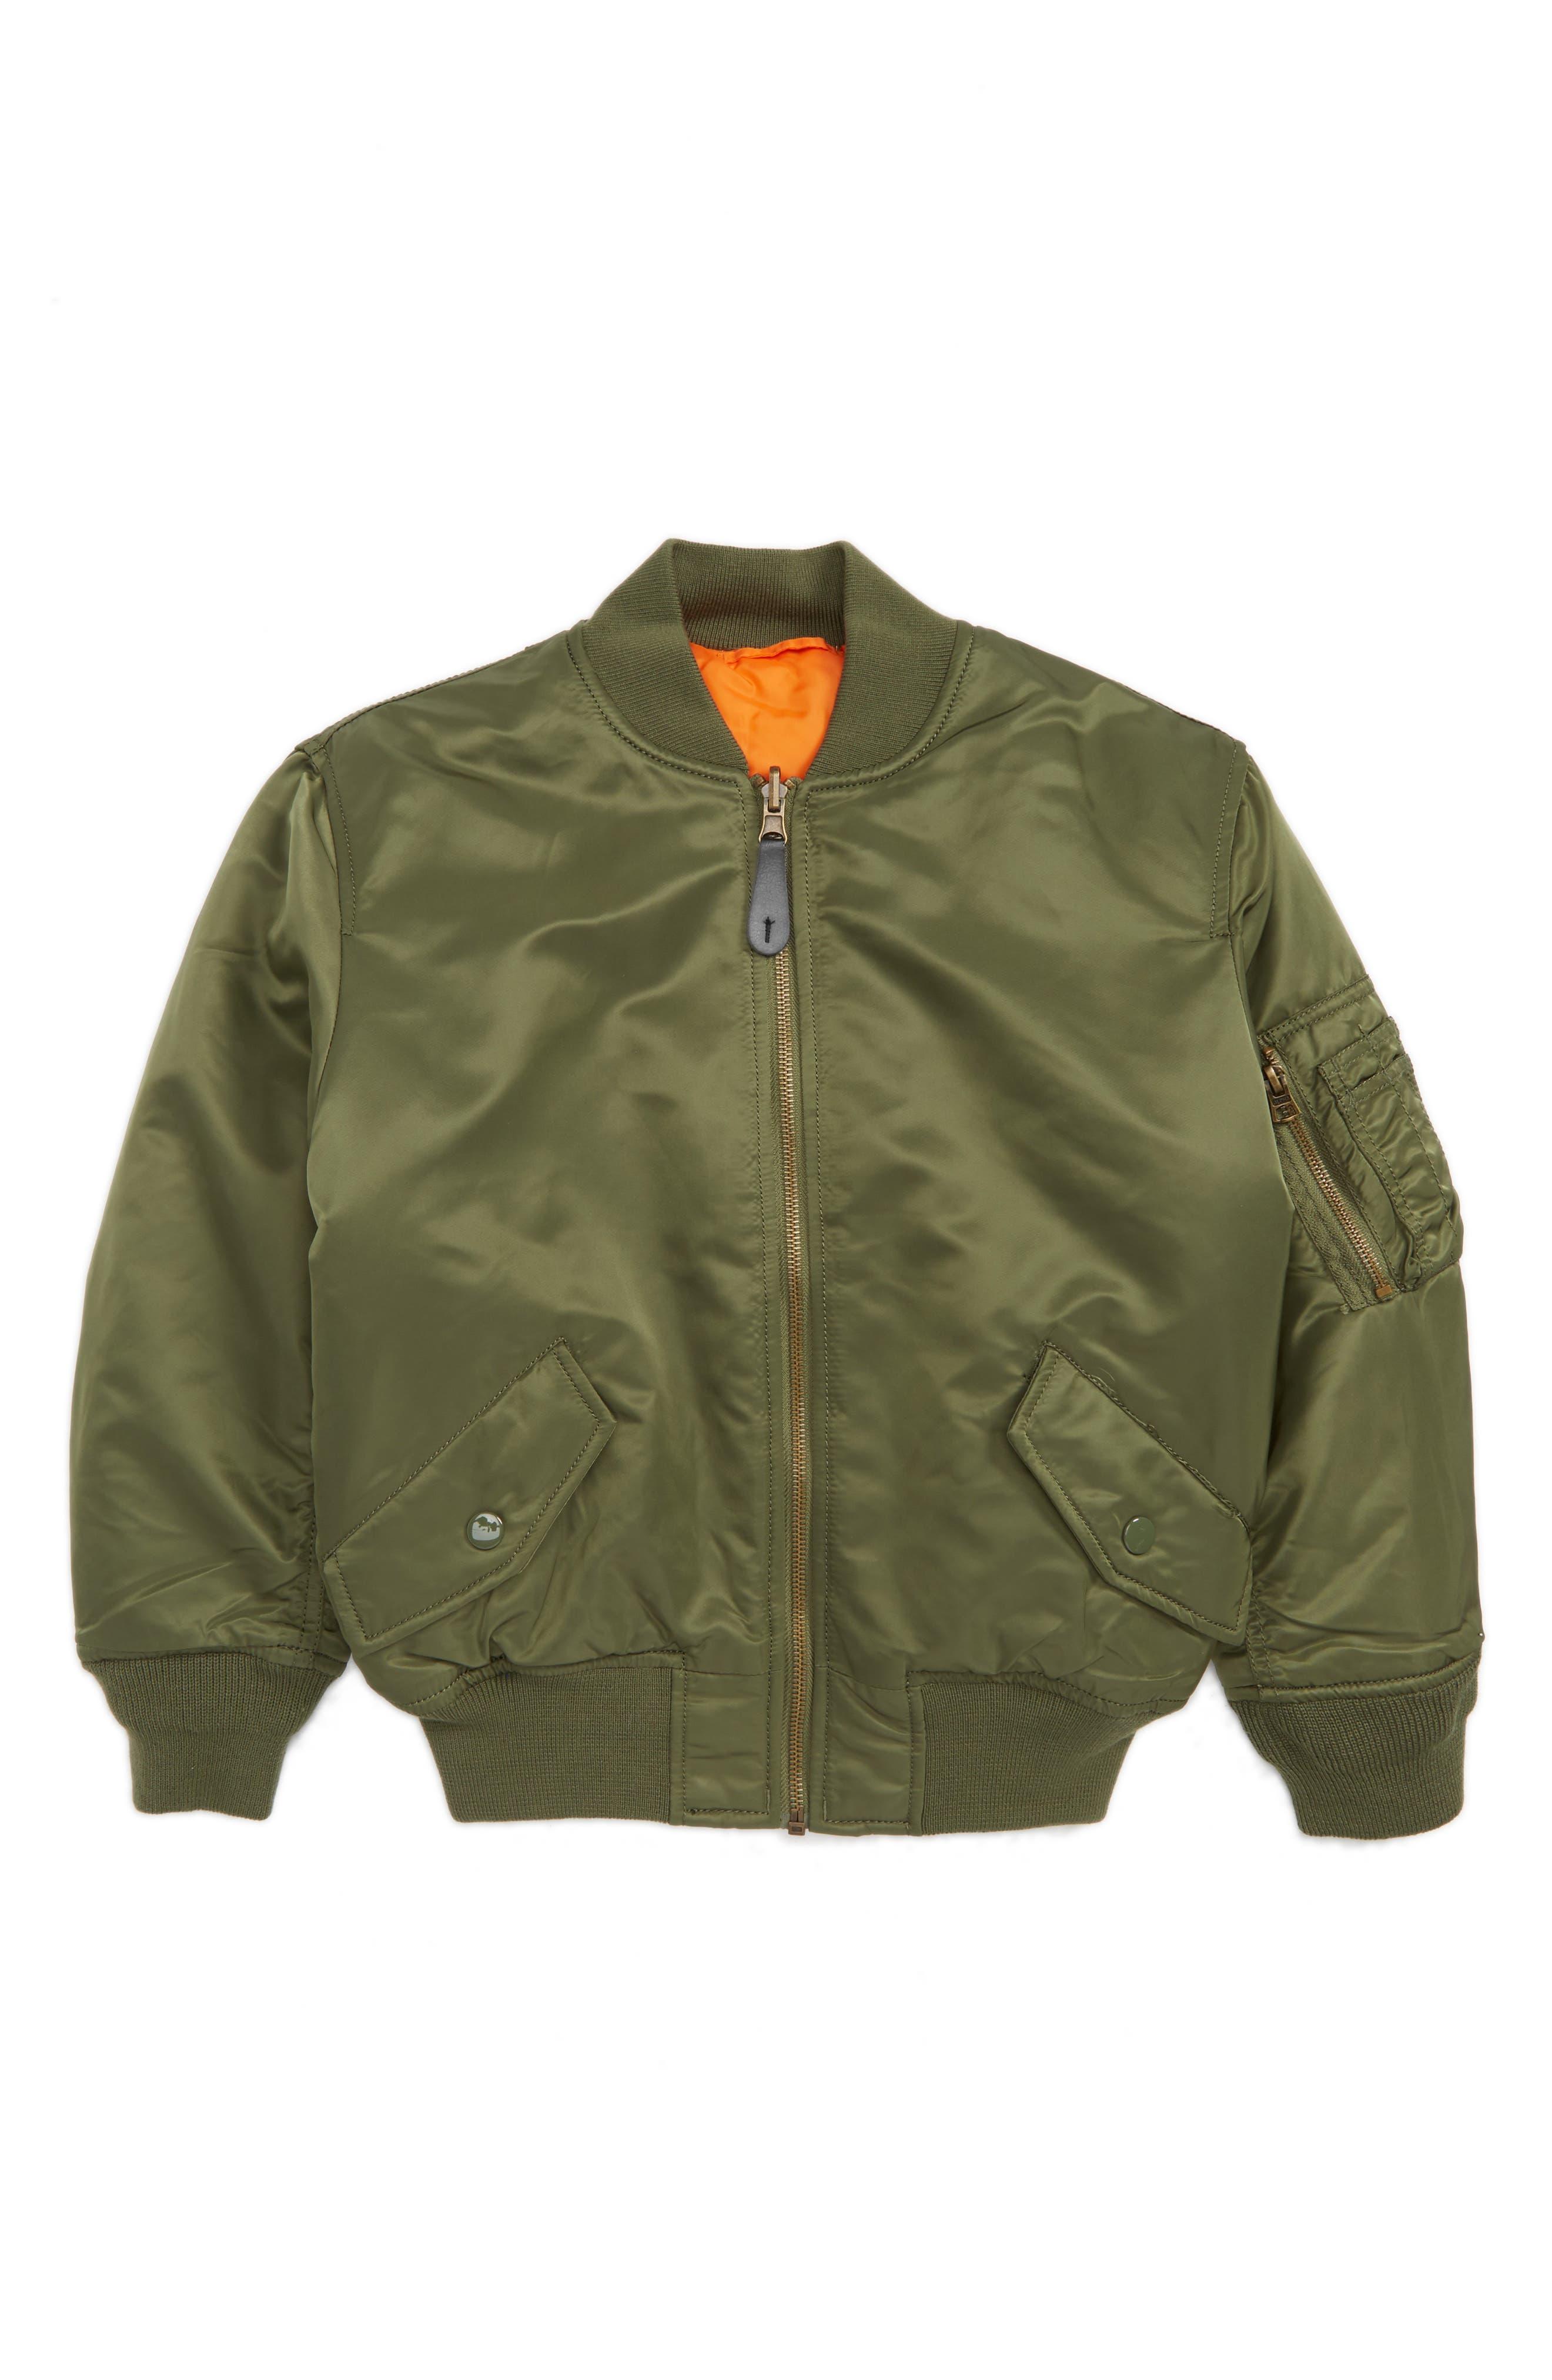 MA-1 Flight Jacket,                         Main,                         color, Sage Green